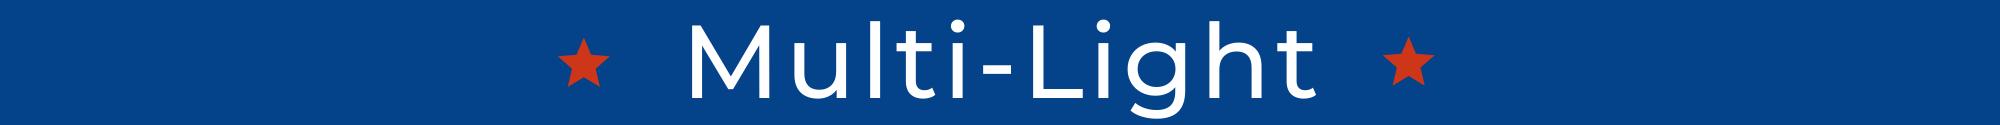 ML Header